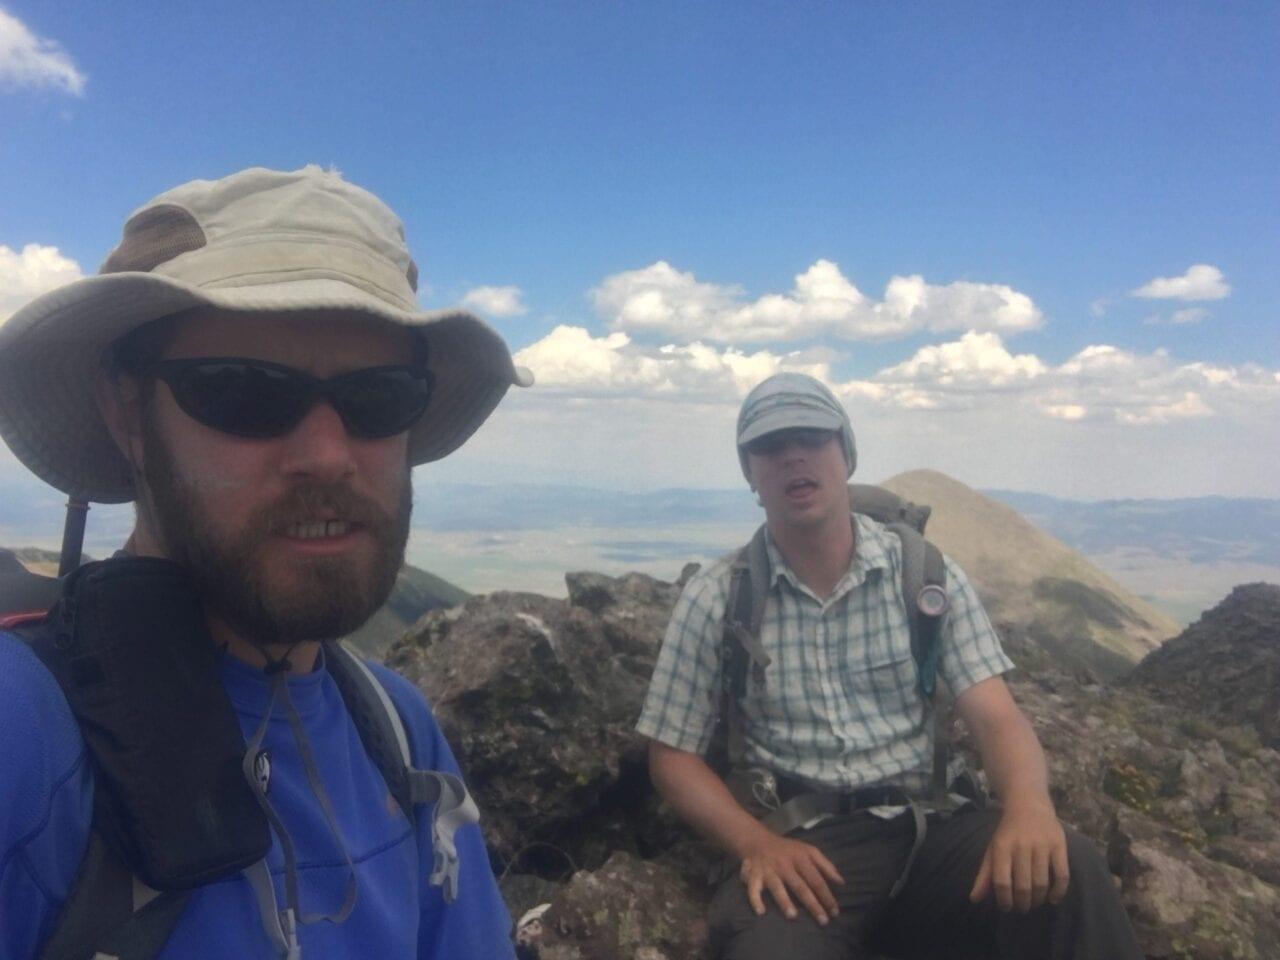 Two hikers sit on rocks on top of a rocky ridgeline.